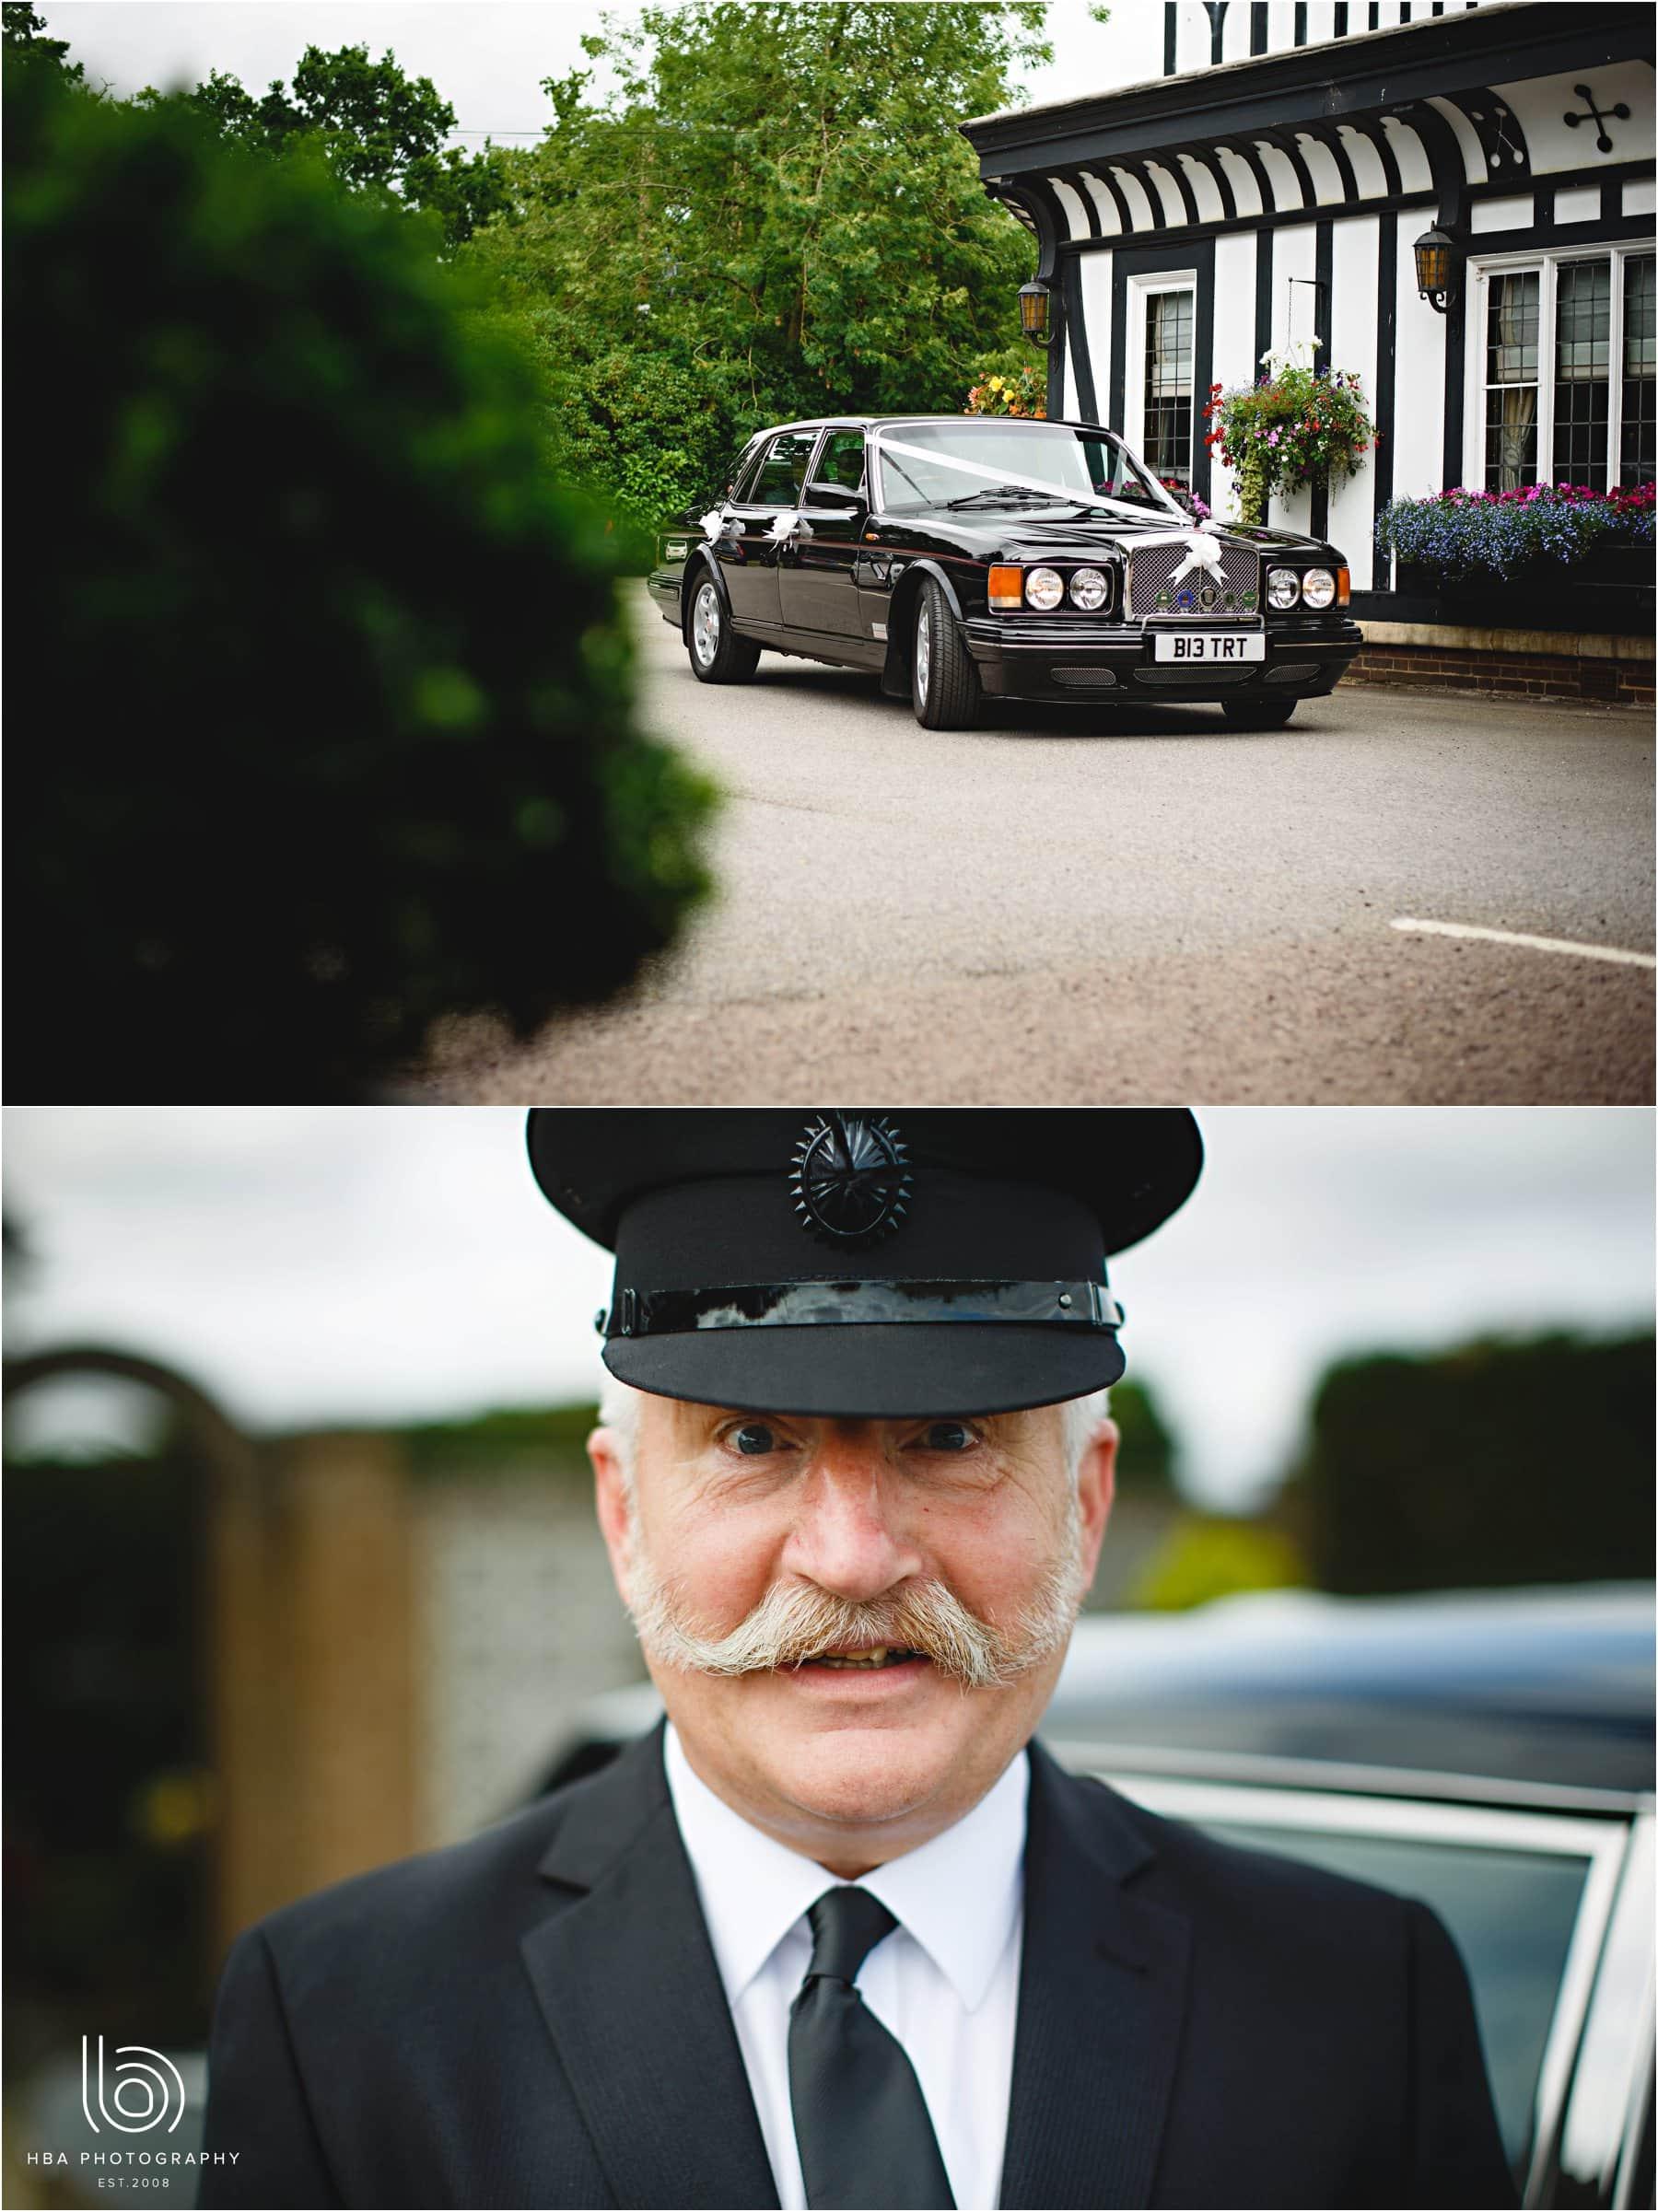 the wedding car and chauffeur